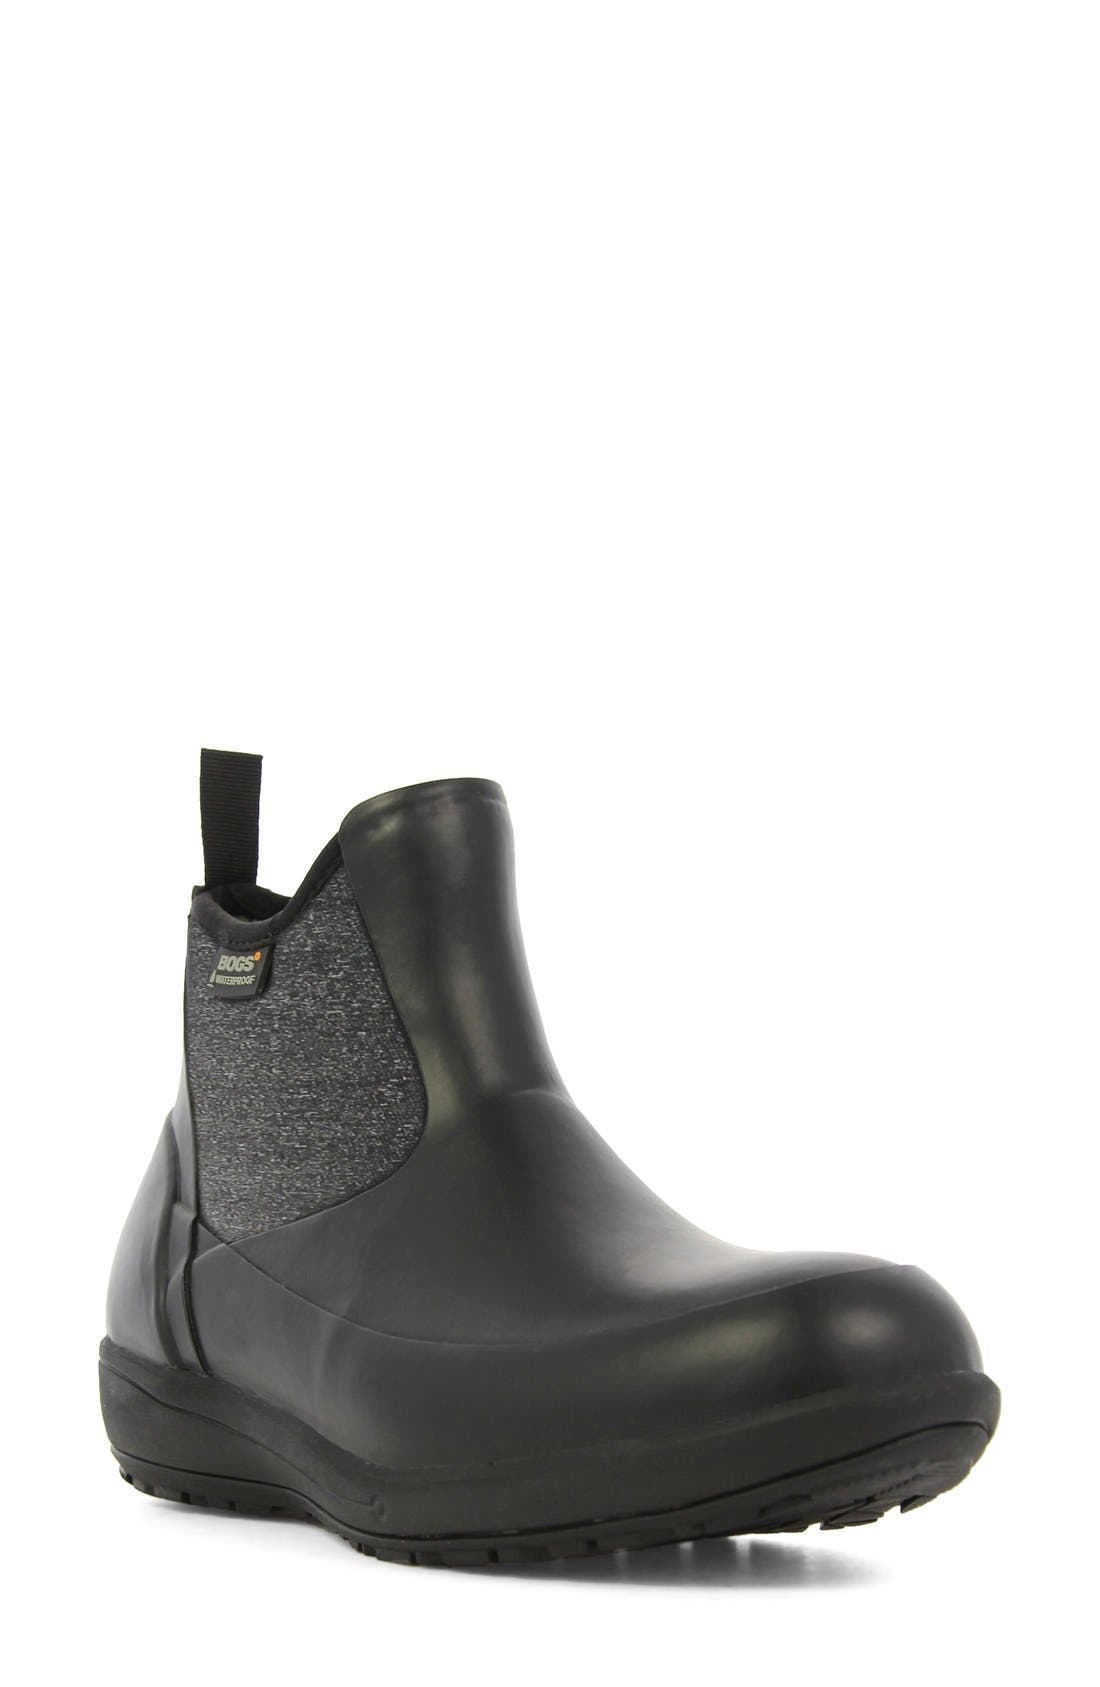 BOGS 'Cami' Waterproof Short Boot